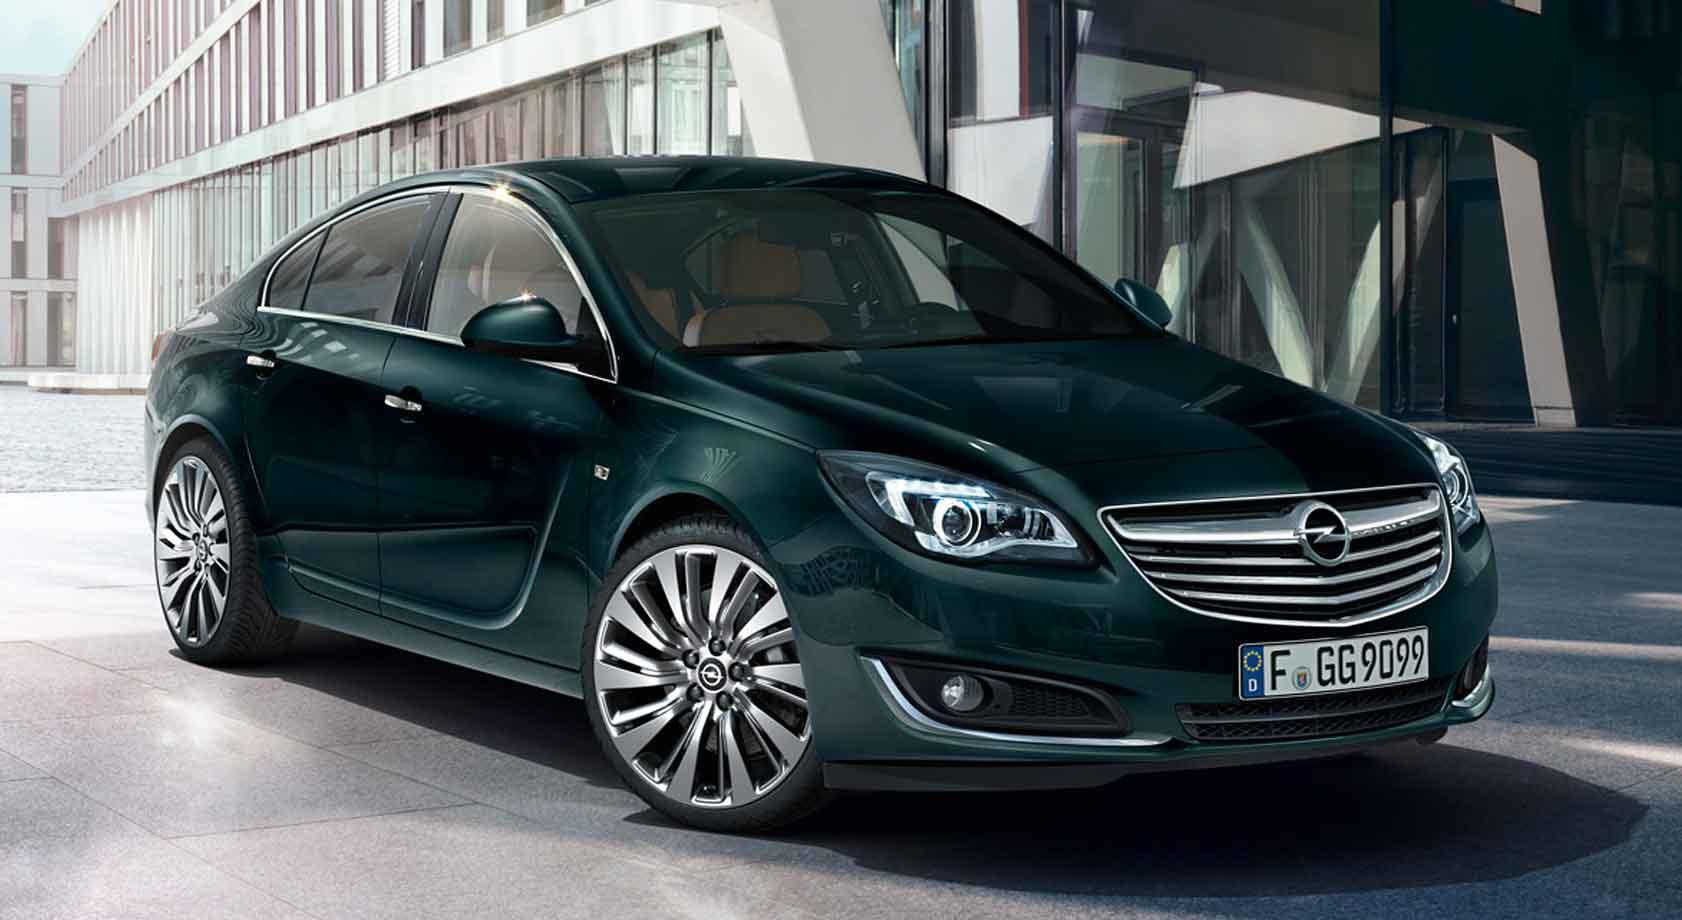 Grønn Opel Insignia 5-dørs